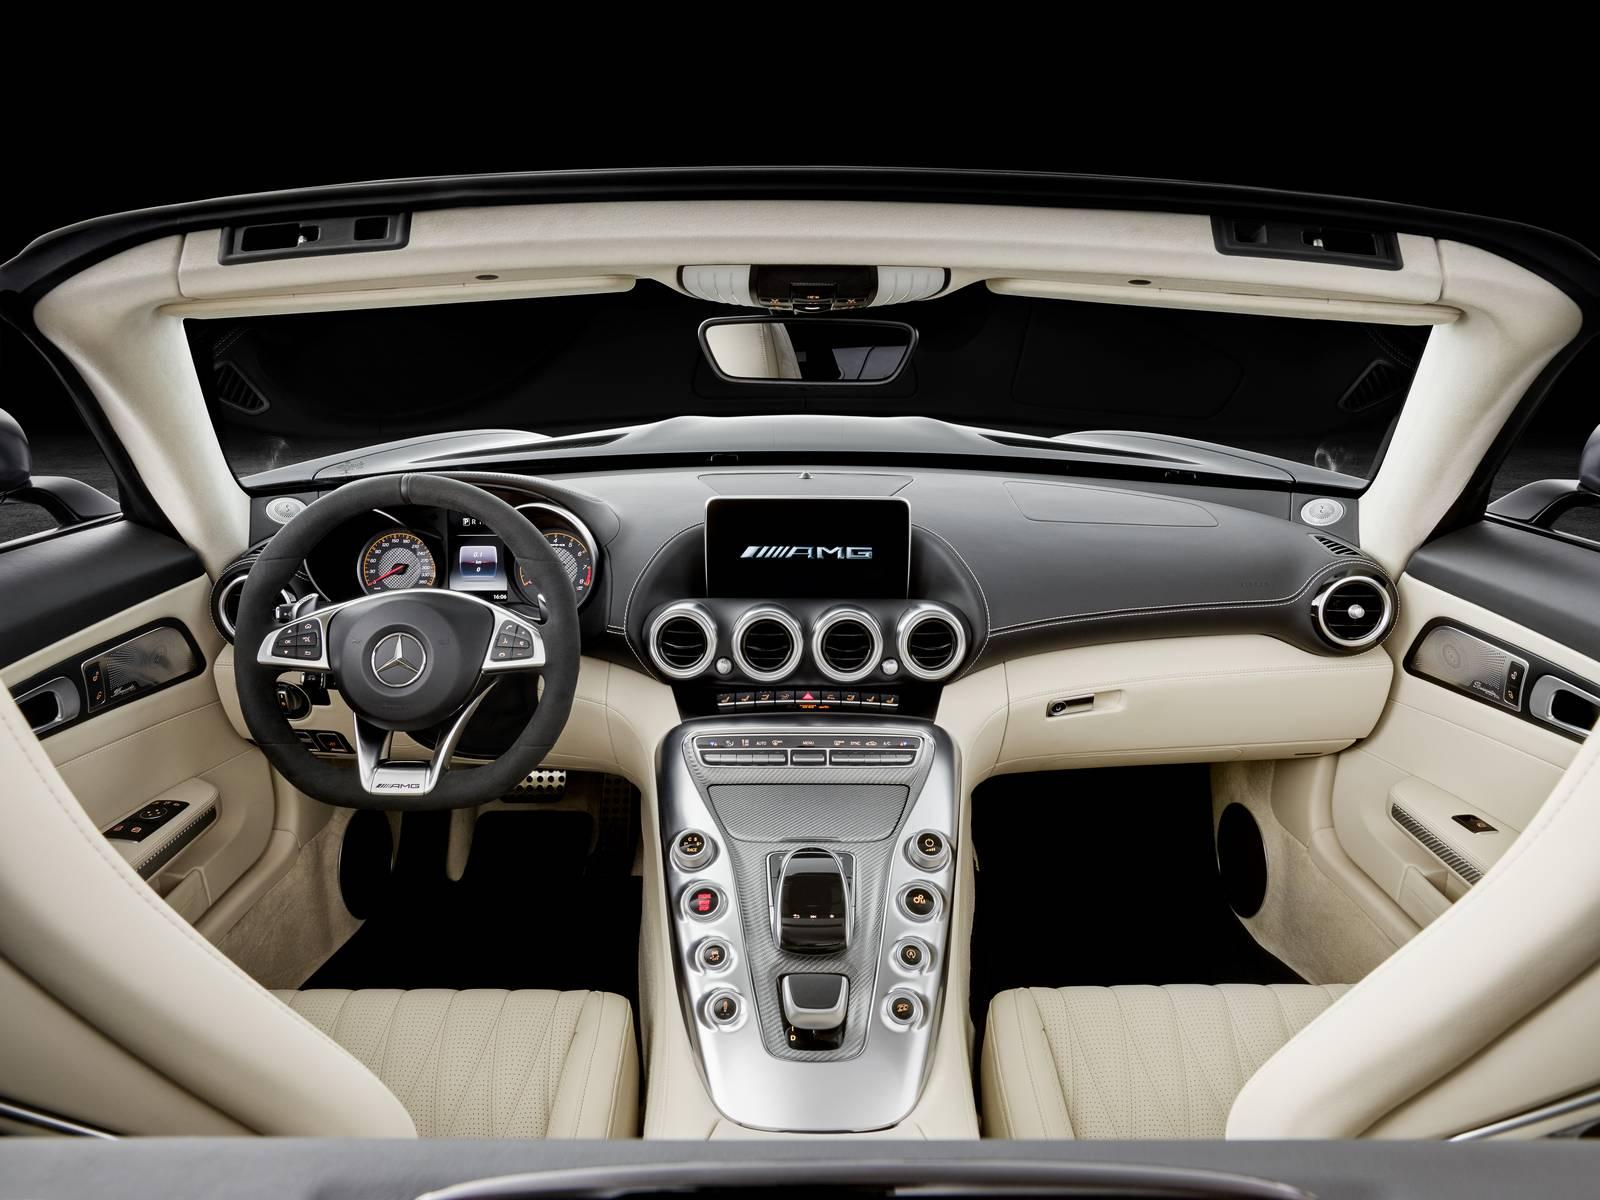 https://storage.googleapis.com/gtspirit/uploads/2016/09/Mercedes-AMG-GT-C-Roadster-8.jpg